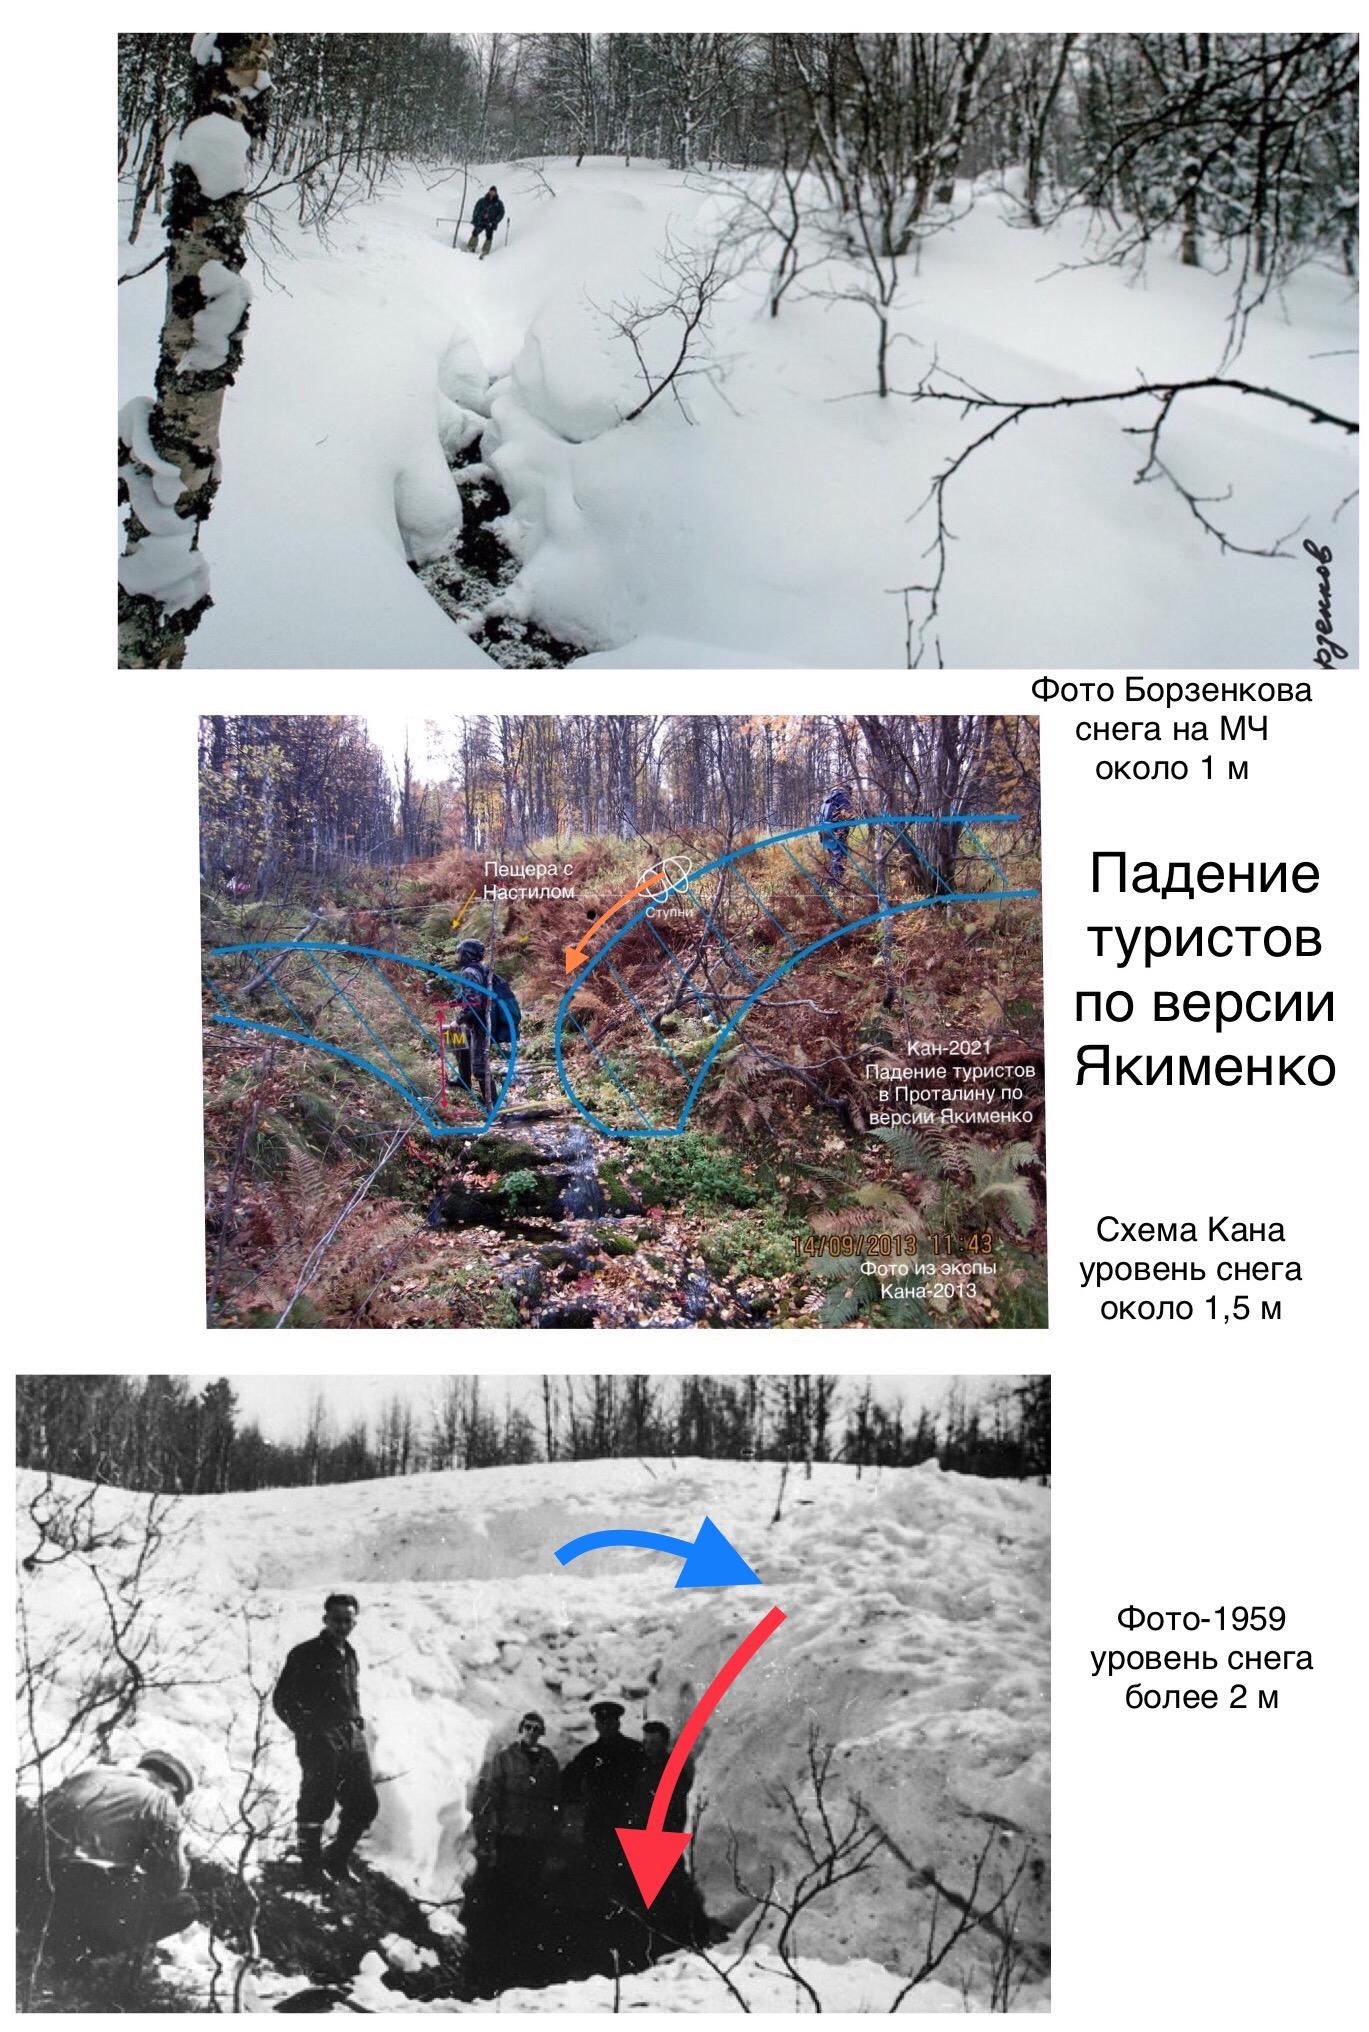 https://rataku.com/images/2021/04/11/73CD810E-DB0D-4D57-BE5E-AD4D81CDC70E.jpg